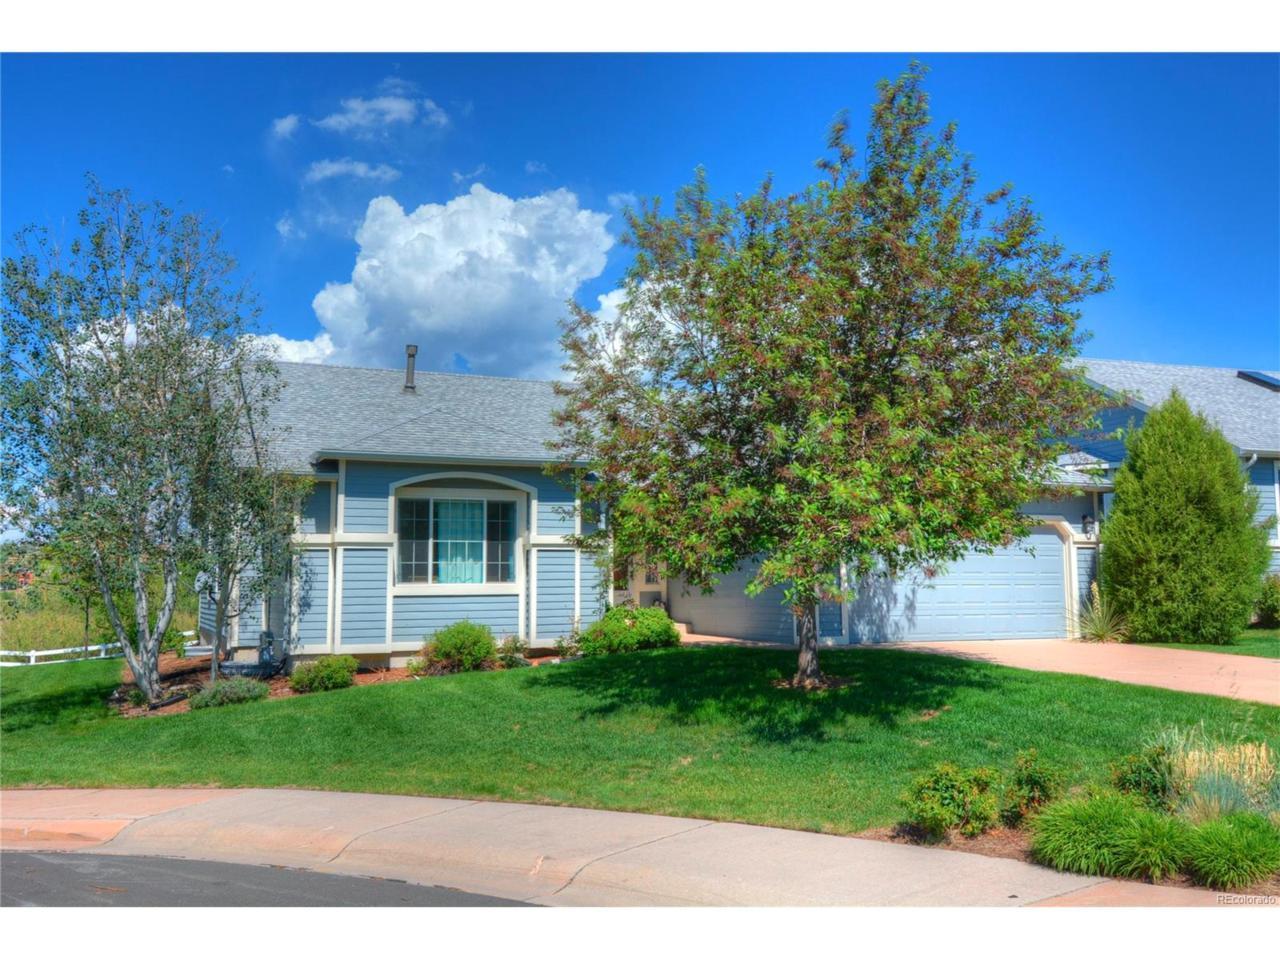 4140 Greens Drive, Colorado Springs, CO 80922 (MLS #5126399) :: 8z Real Estate